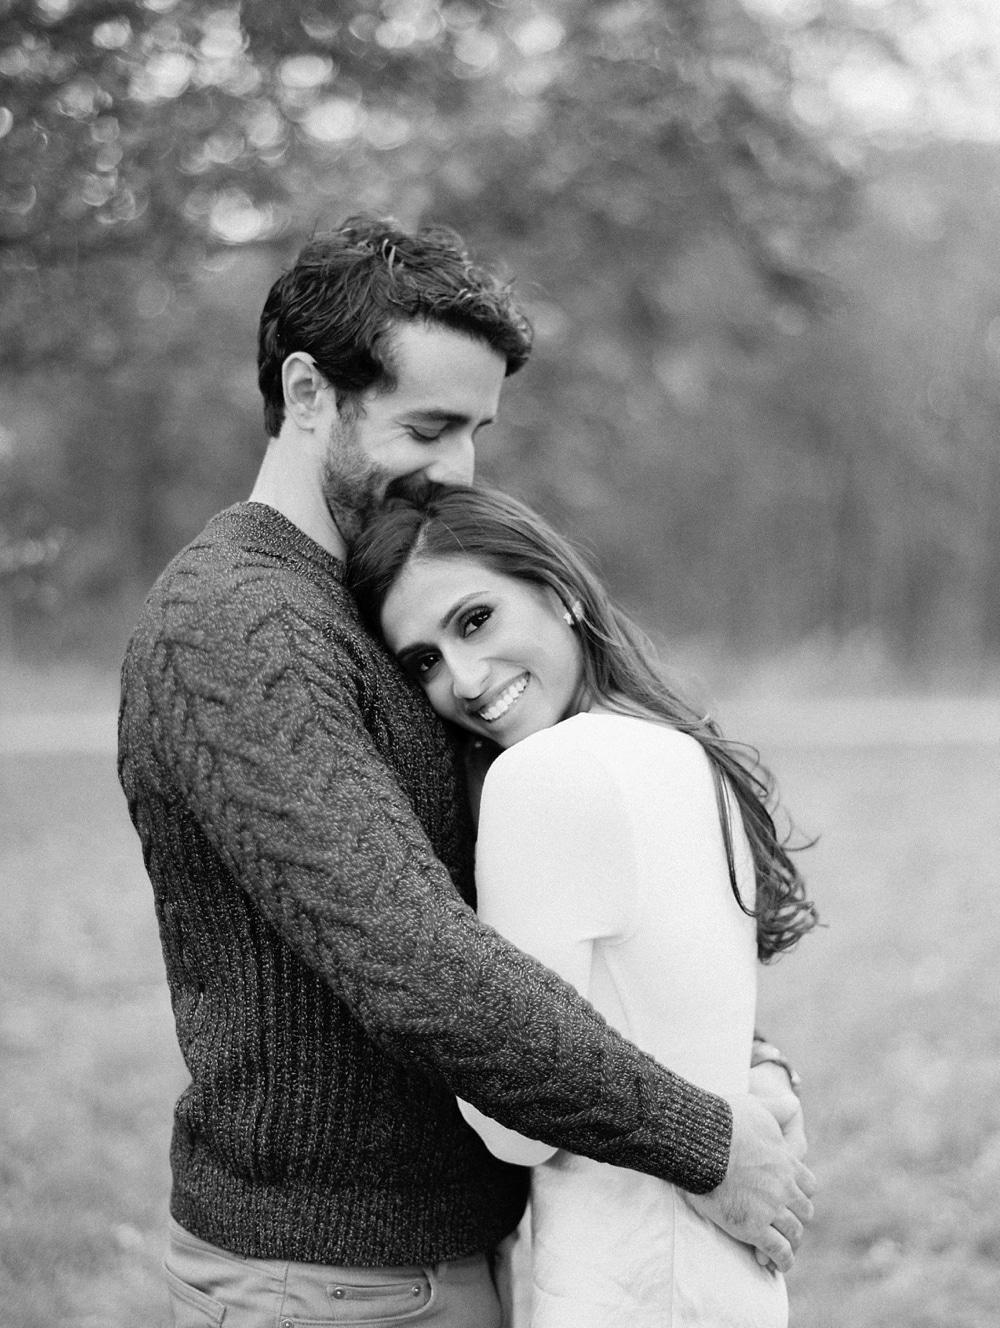 Kristin-La-Voie-Photography-morton-arboretum-chicago-wedding-photographer-38